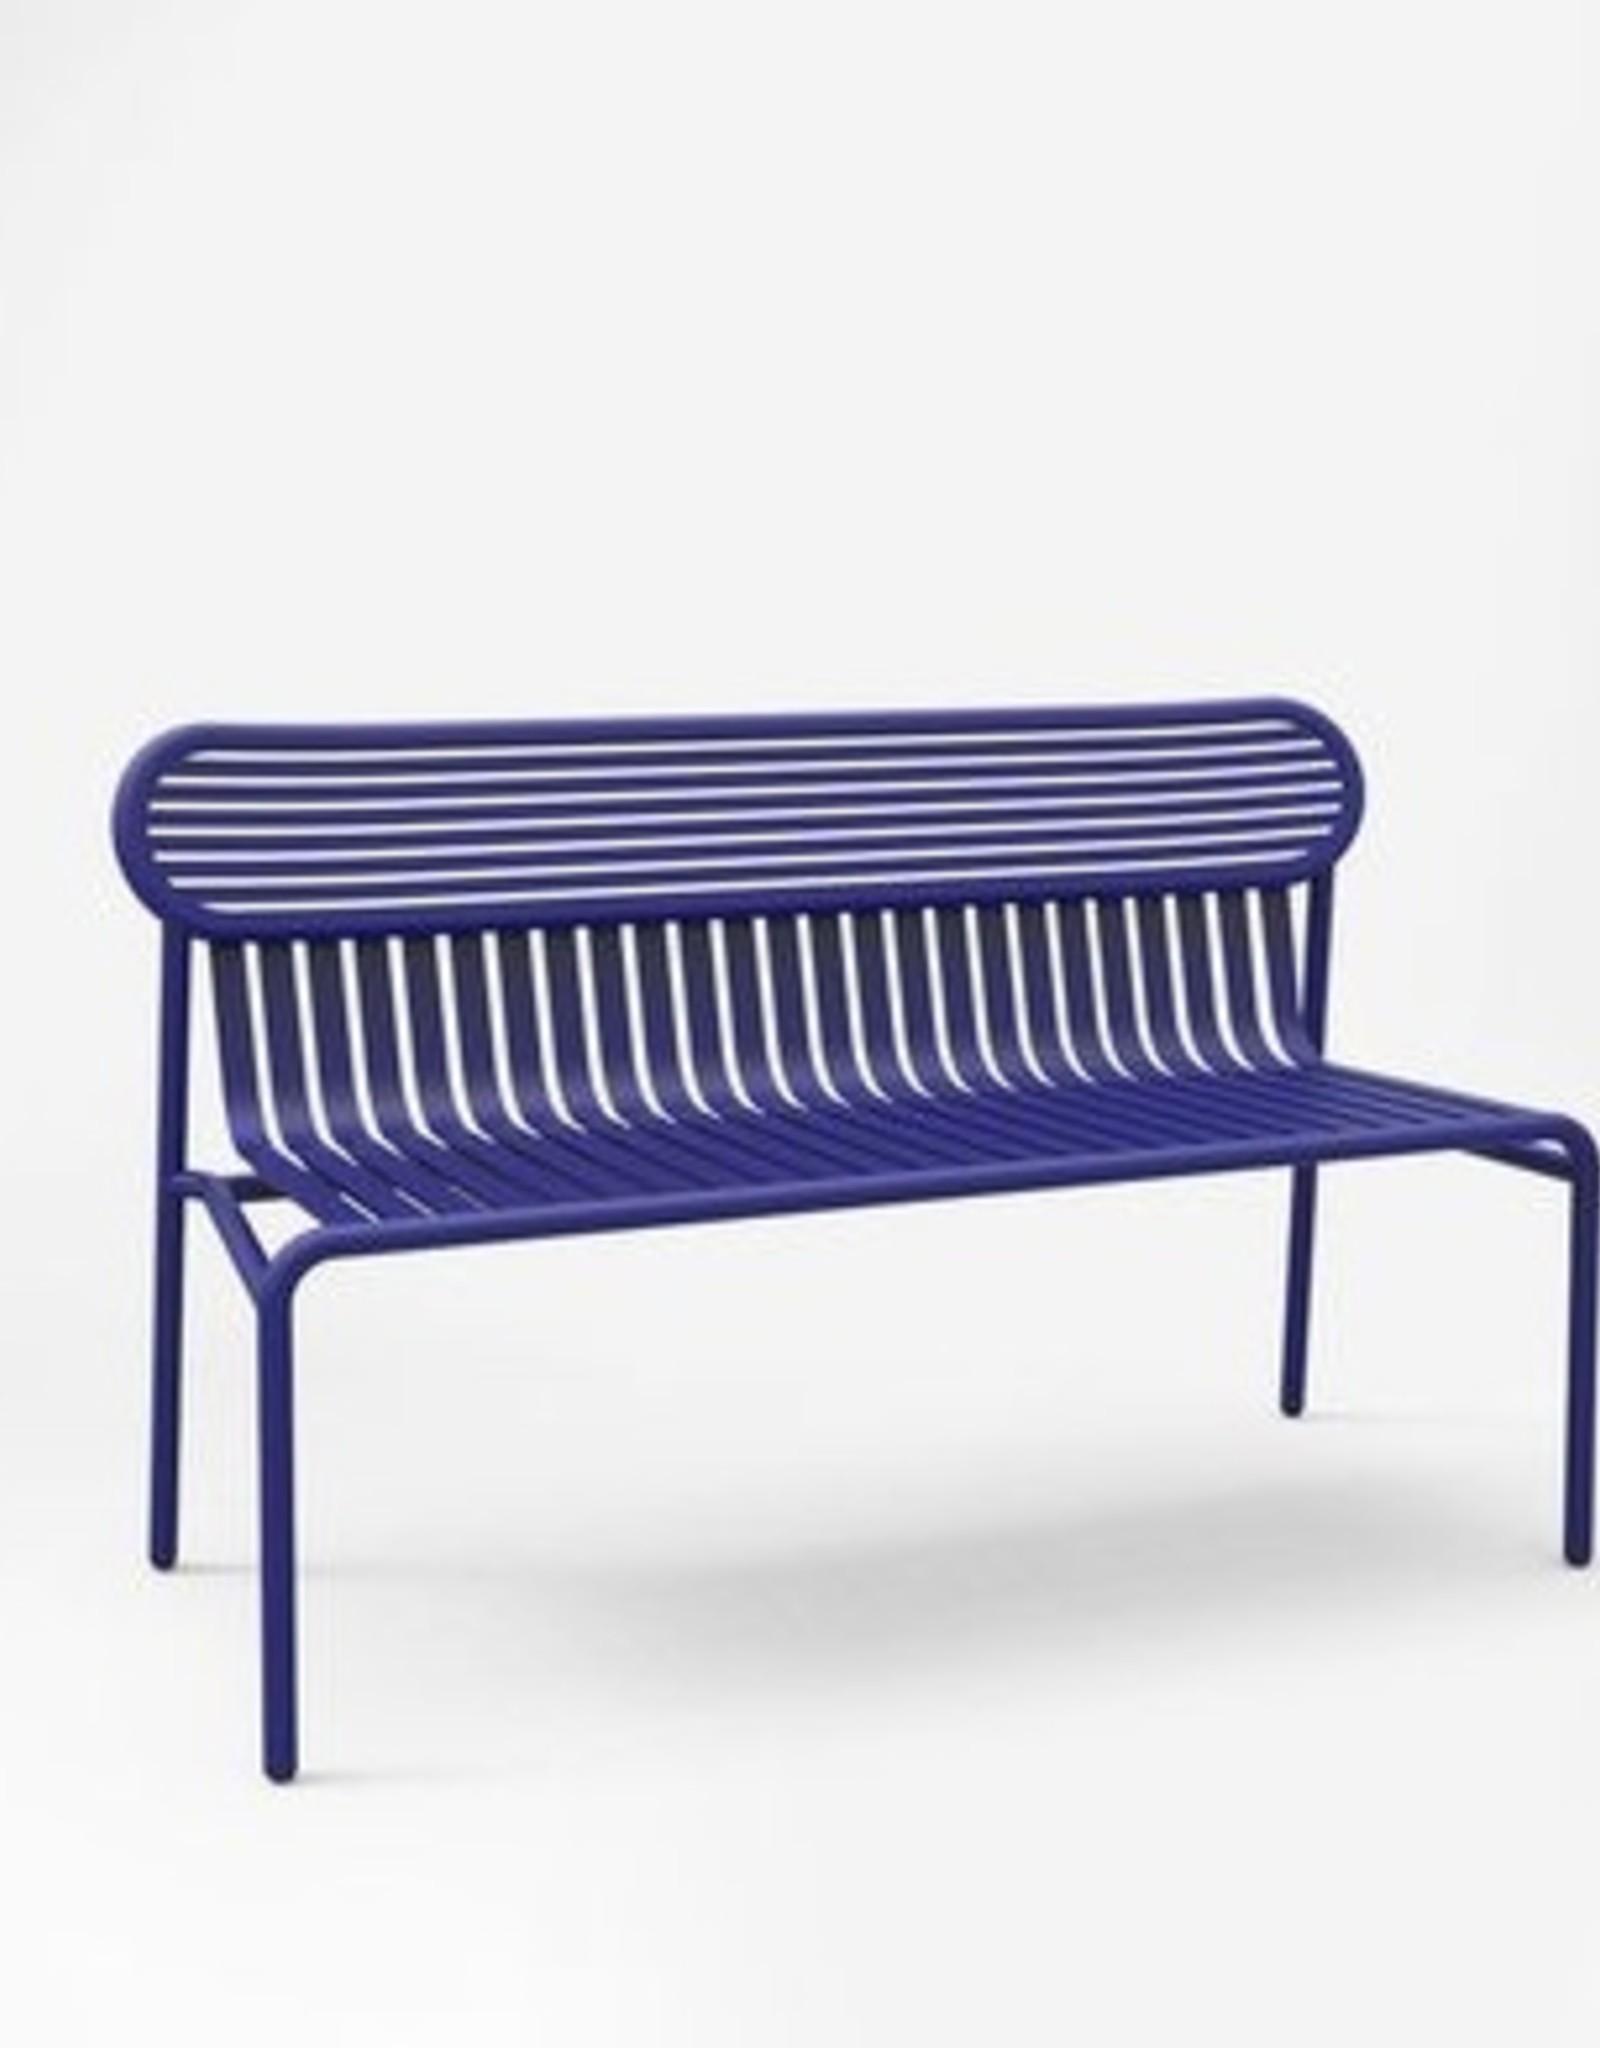 Petite Friture Petite Friture Week-End Bench